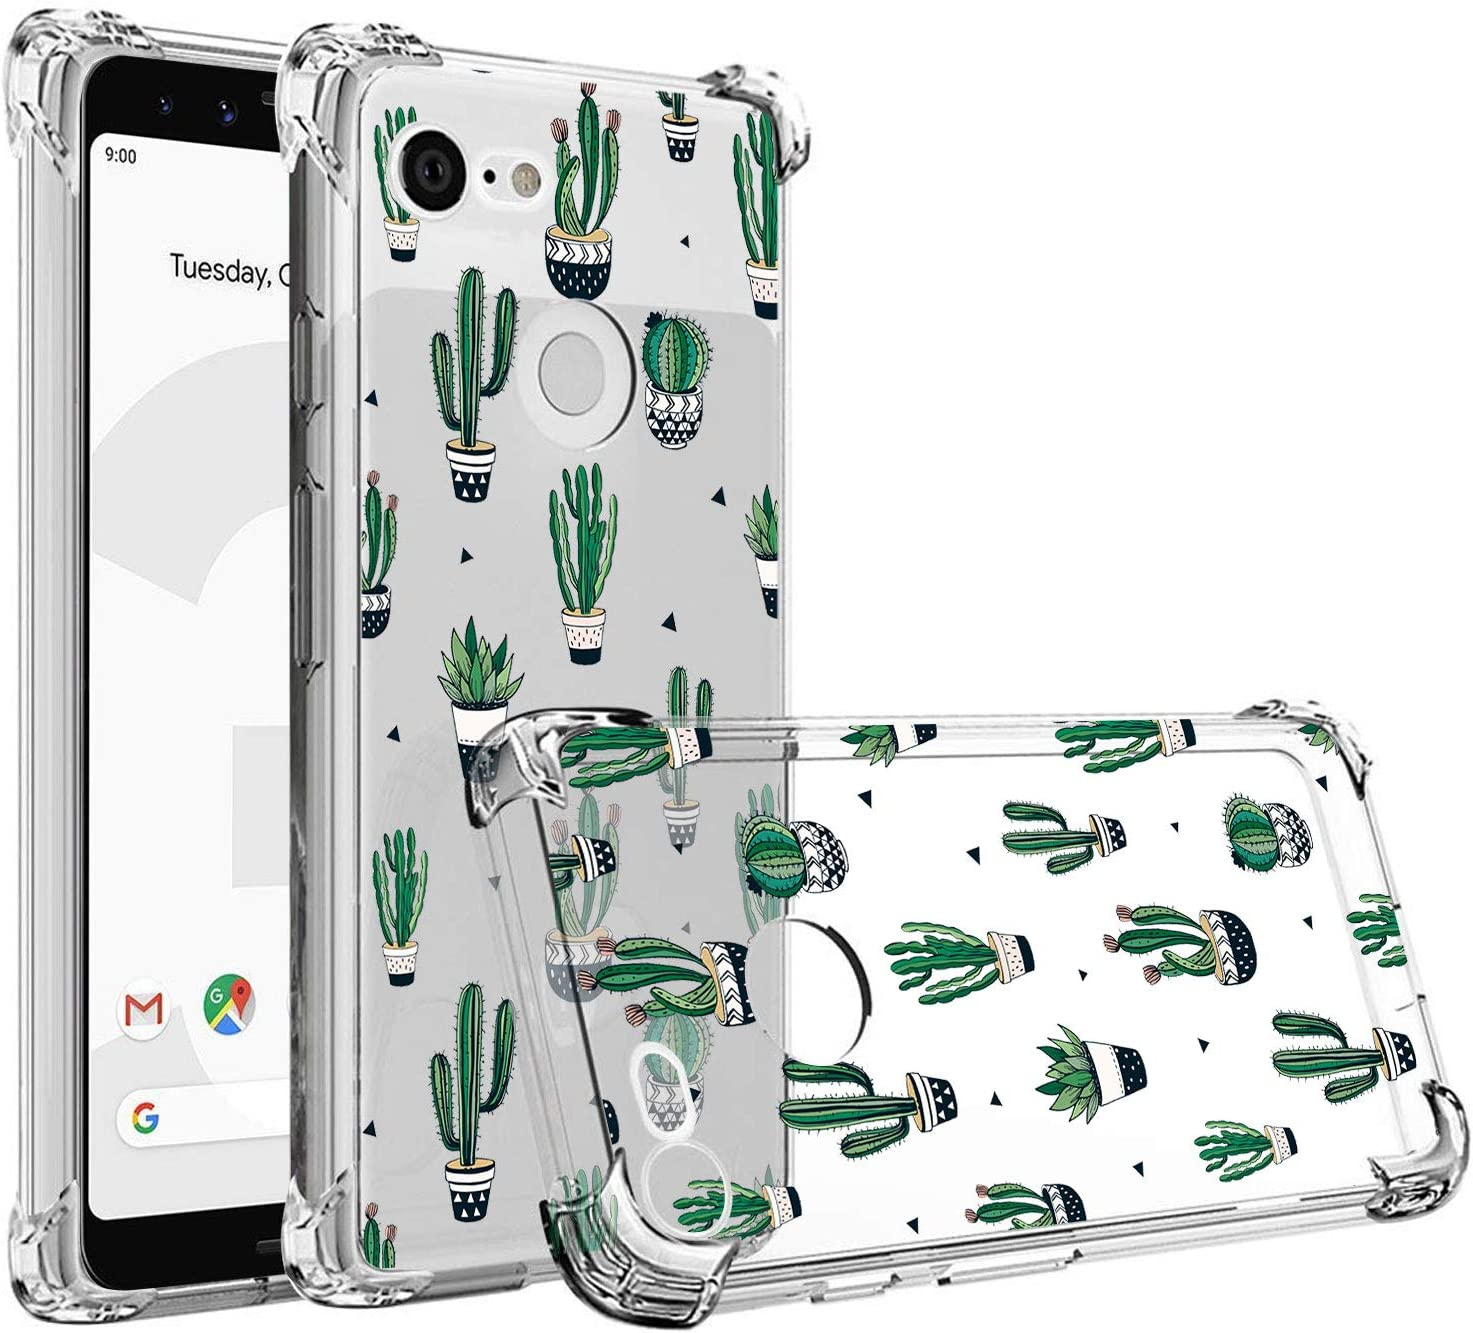 RXKEJI Google Pixel 3a Case Clear Cute Girls Floral Design TPU Soft Slim Flexible Silicone Cover Phone Case for Google Pixel 3a (2019) - Cactus Green